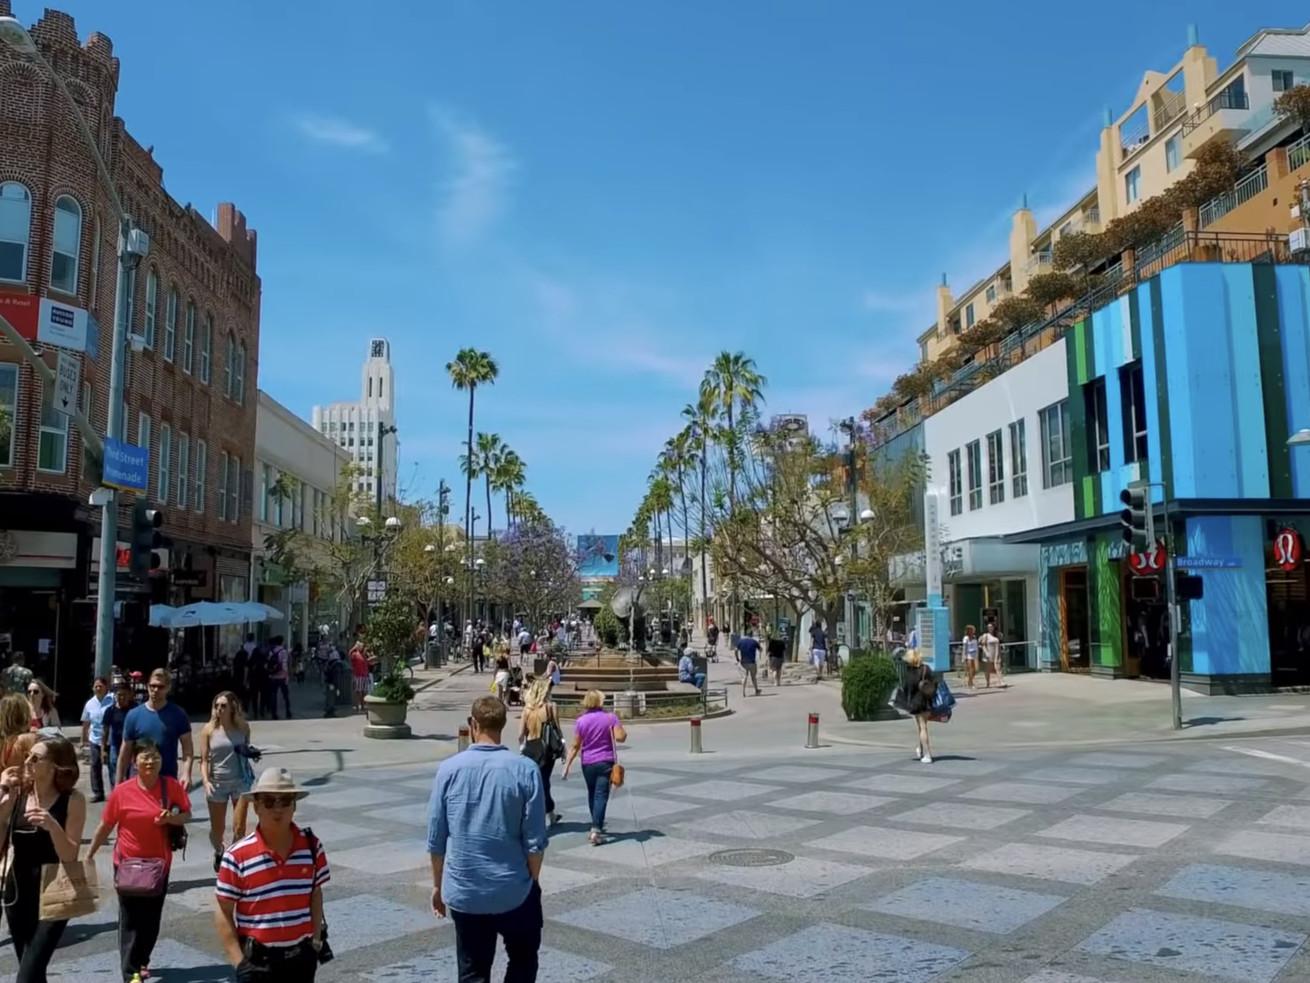 Third St. Promenade